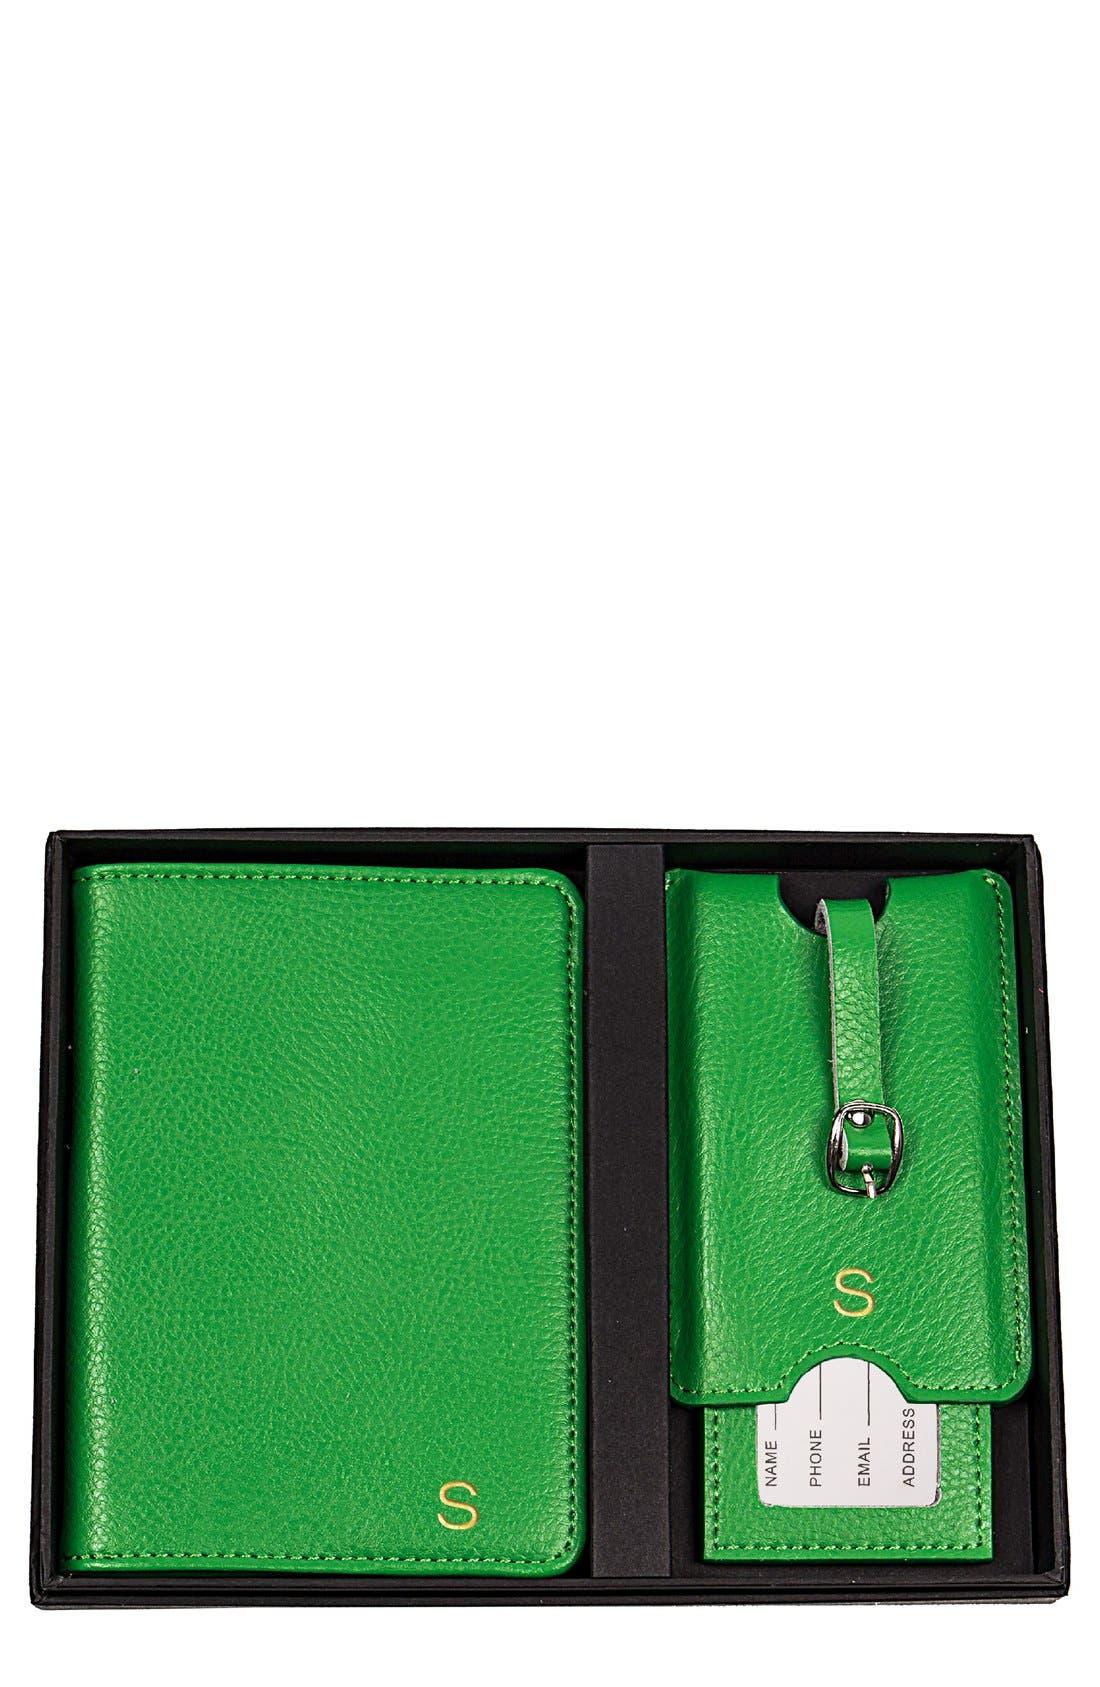 Monogram Passport Case & Luggage Tag,                             Main thumbnail 1, color,                             Green - S